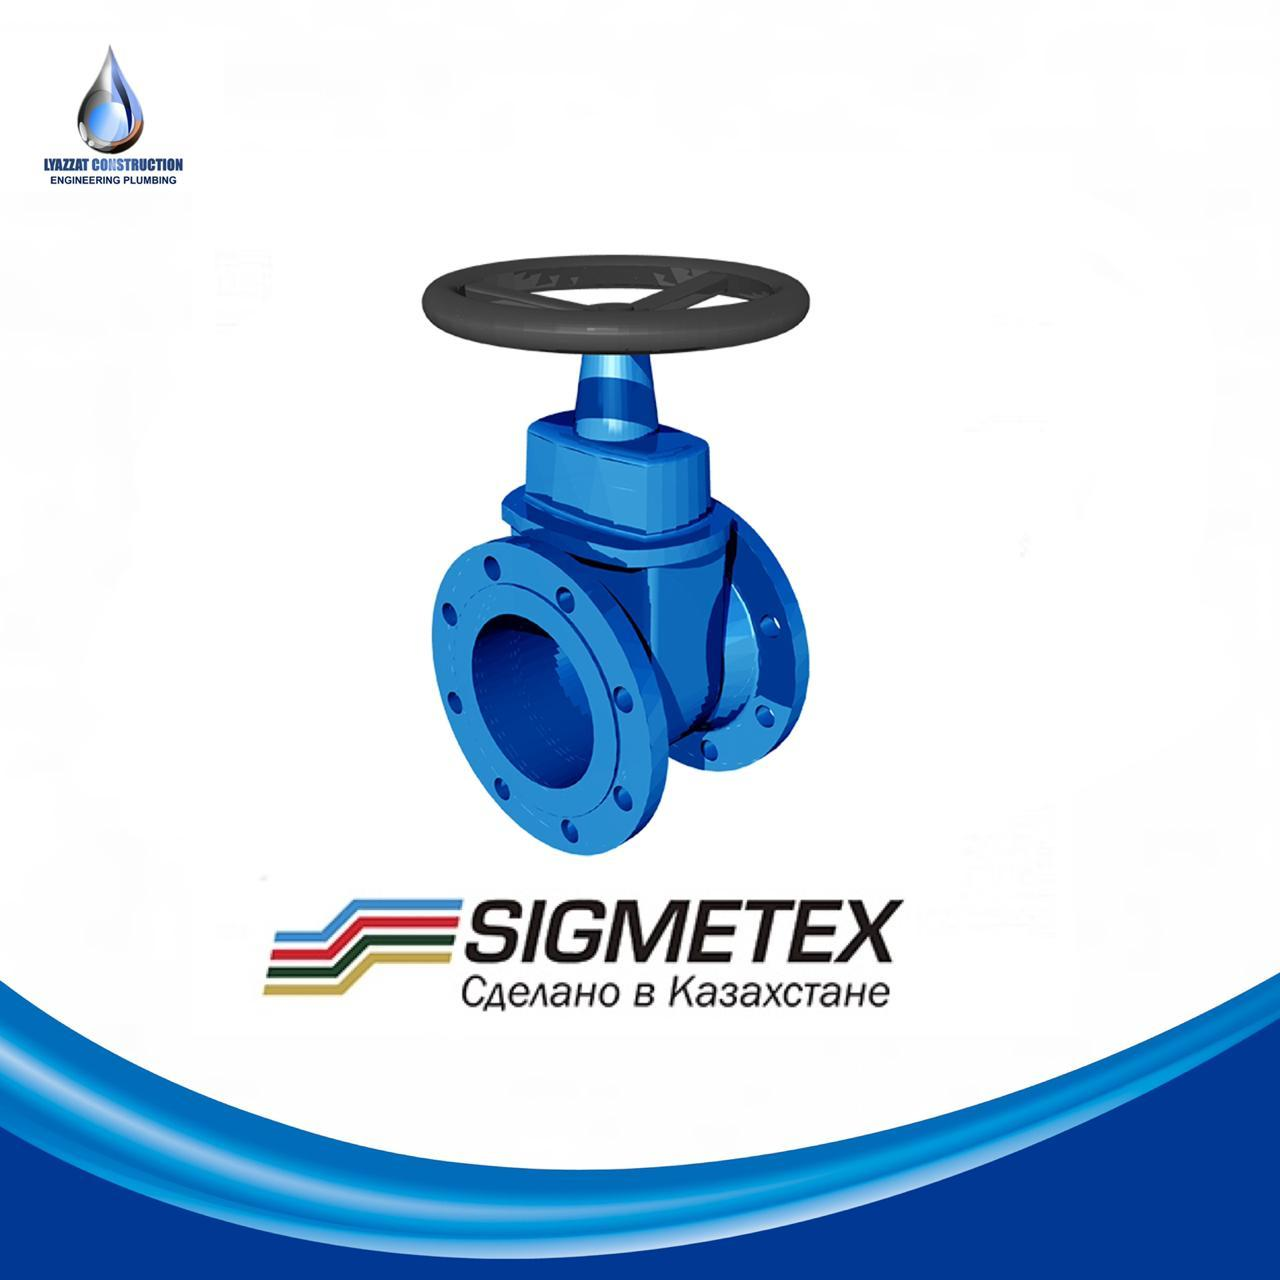 Задвижка Sigmetex DN 400 (Сигметэкс)